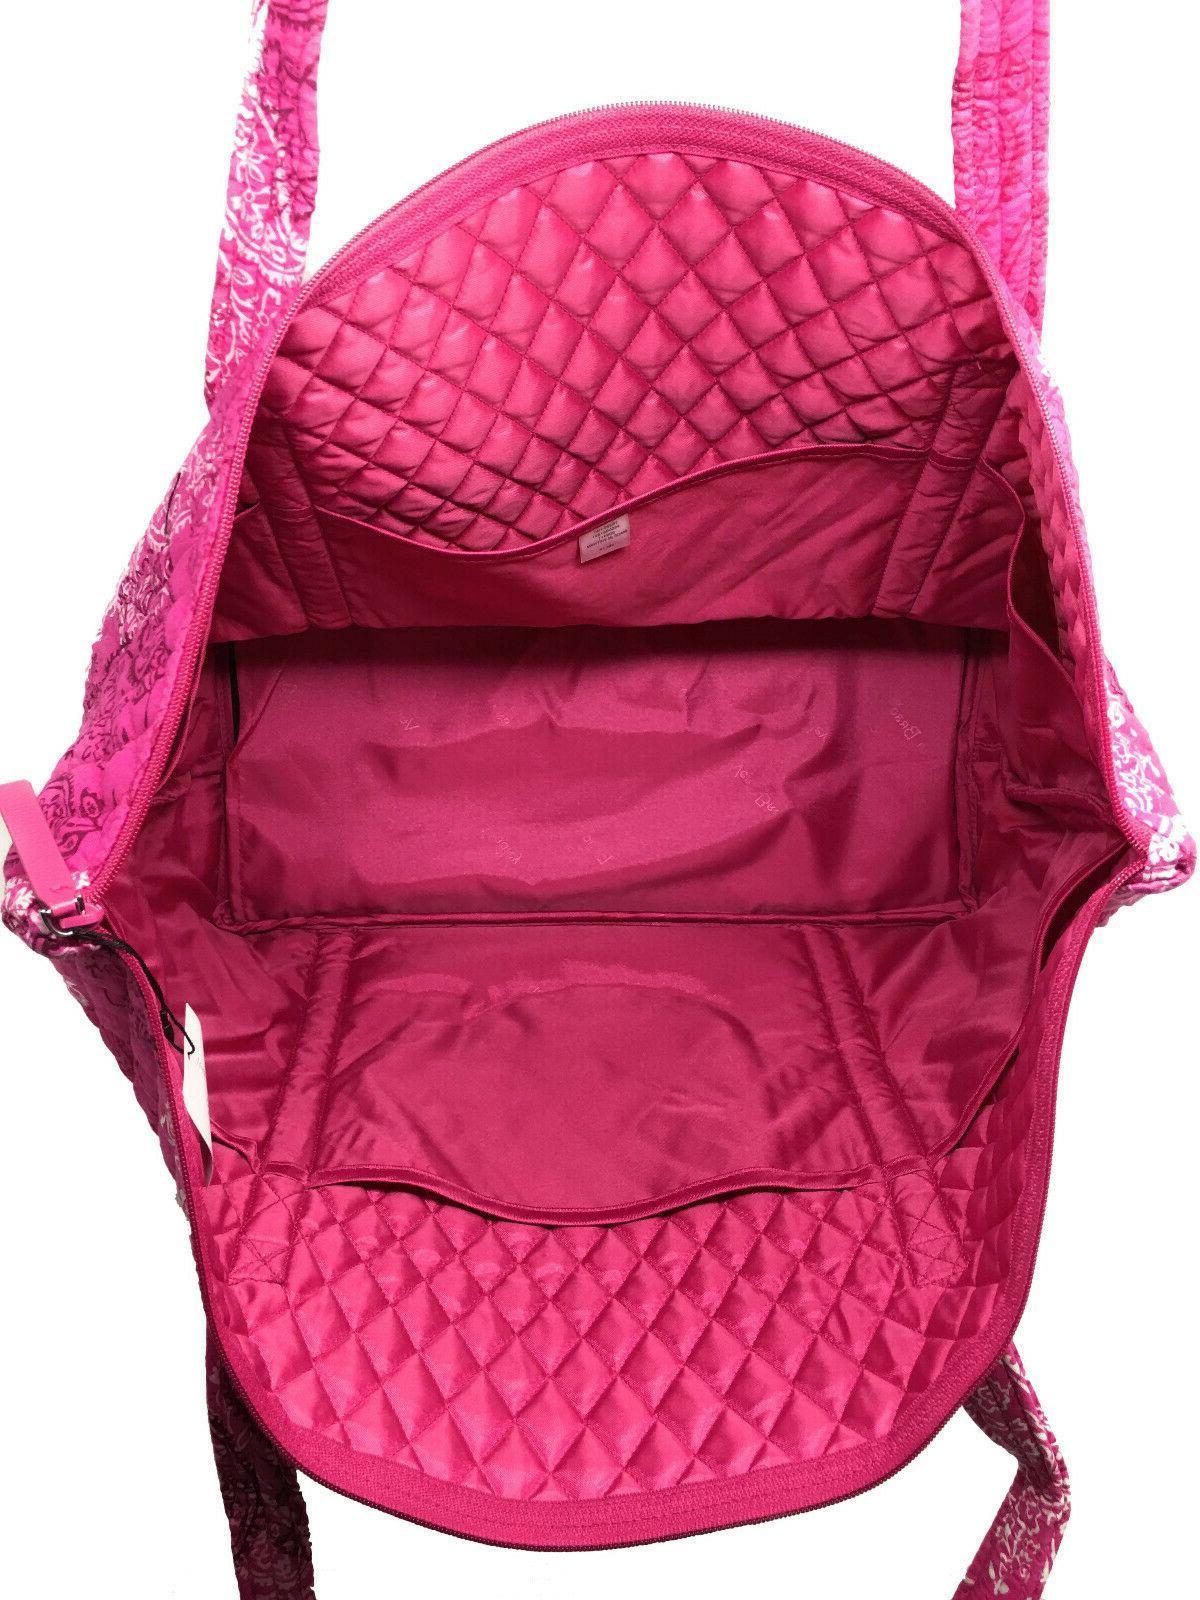 Vera Bradley Carryon Luggage in - NWT